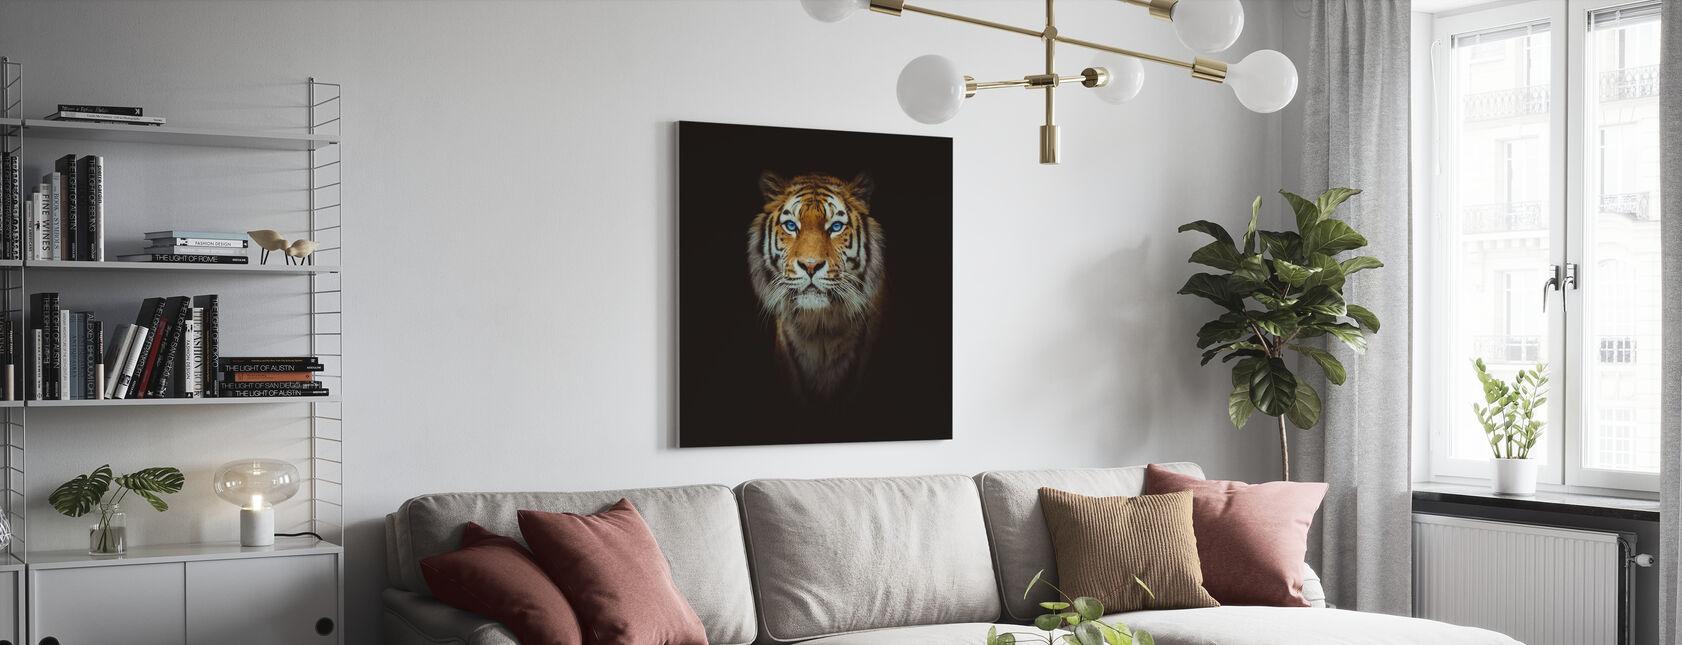 Tigerns öga - Canvastavla - Vardagsrum